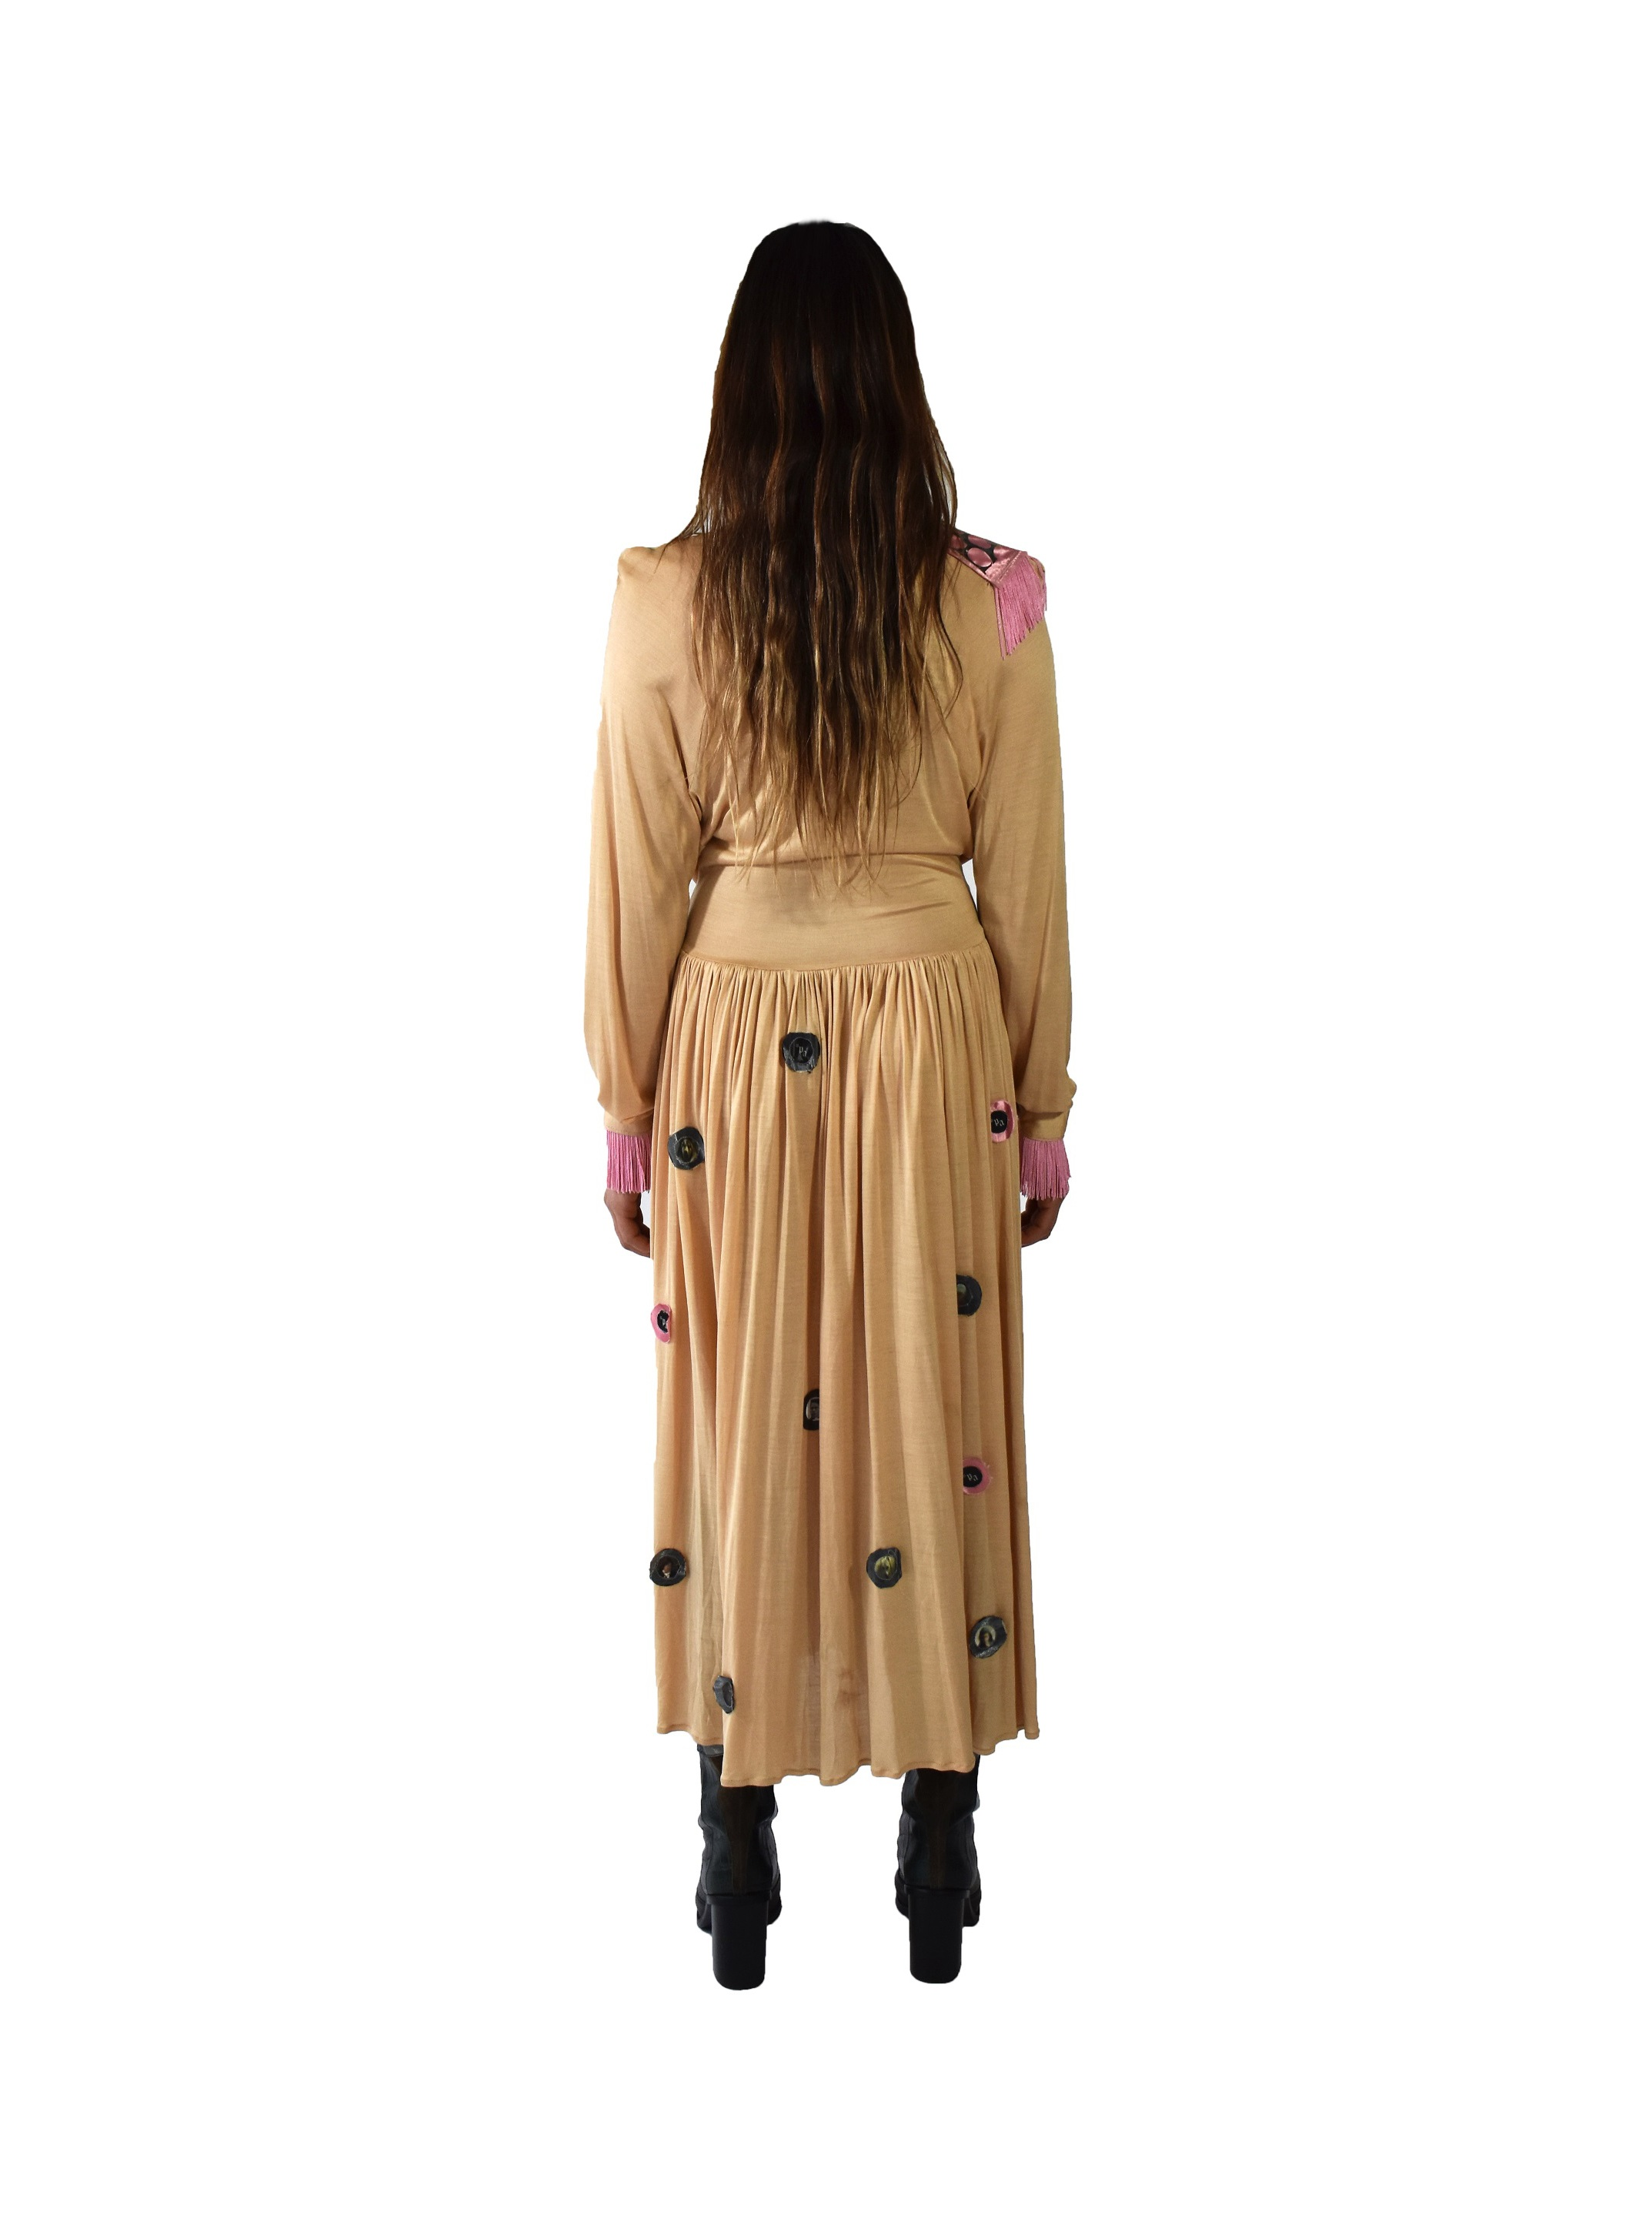 Linda Dresner x *Paid Actor dress